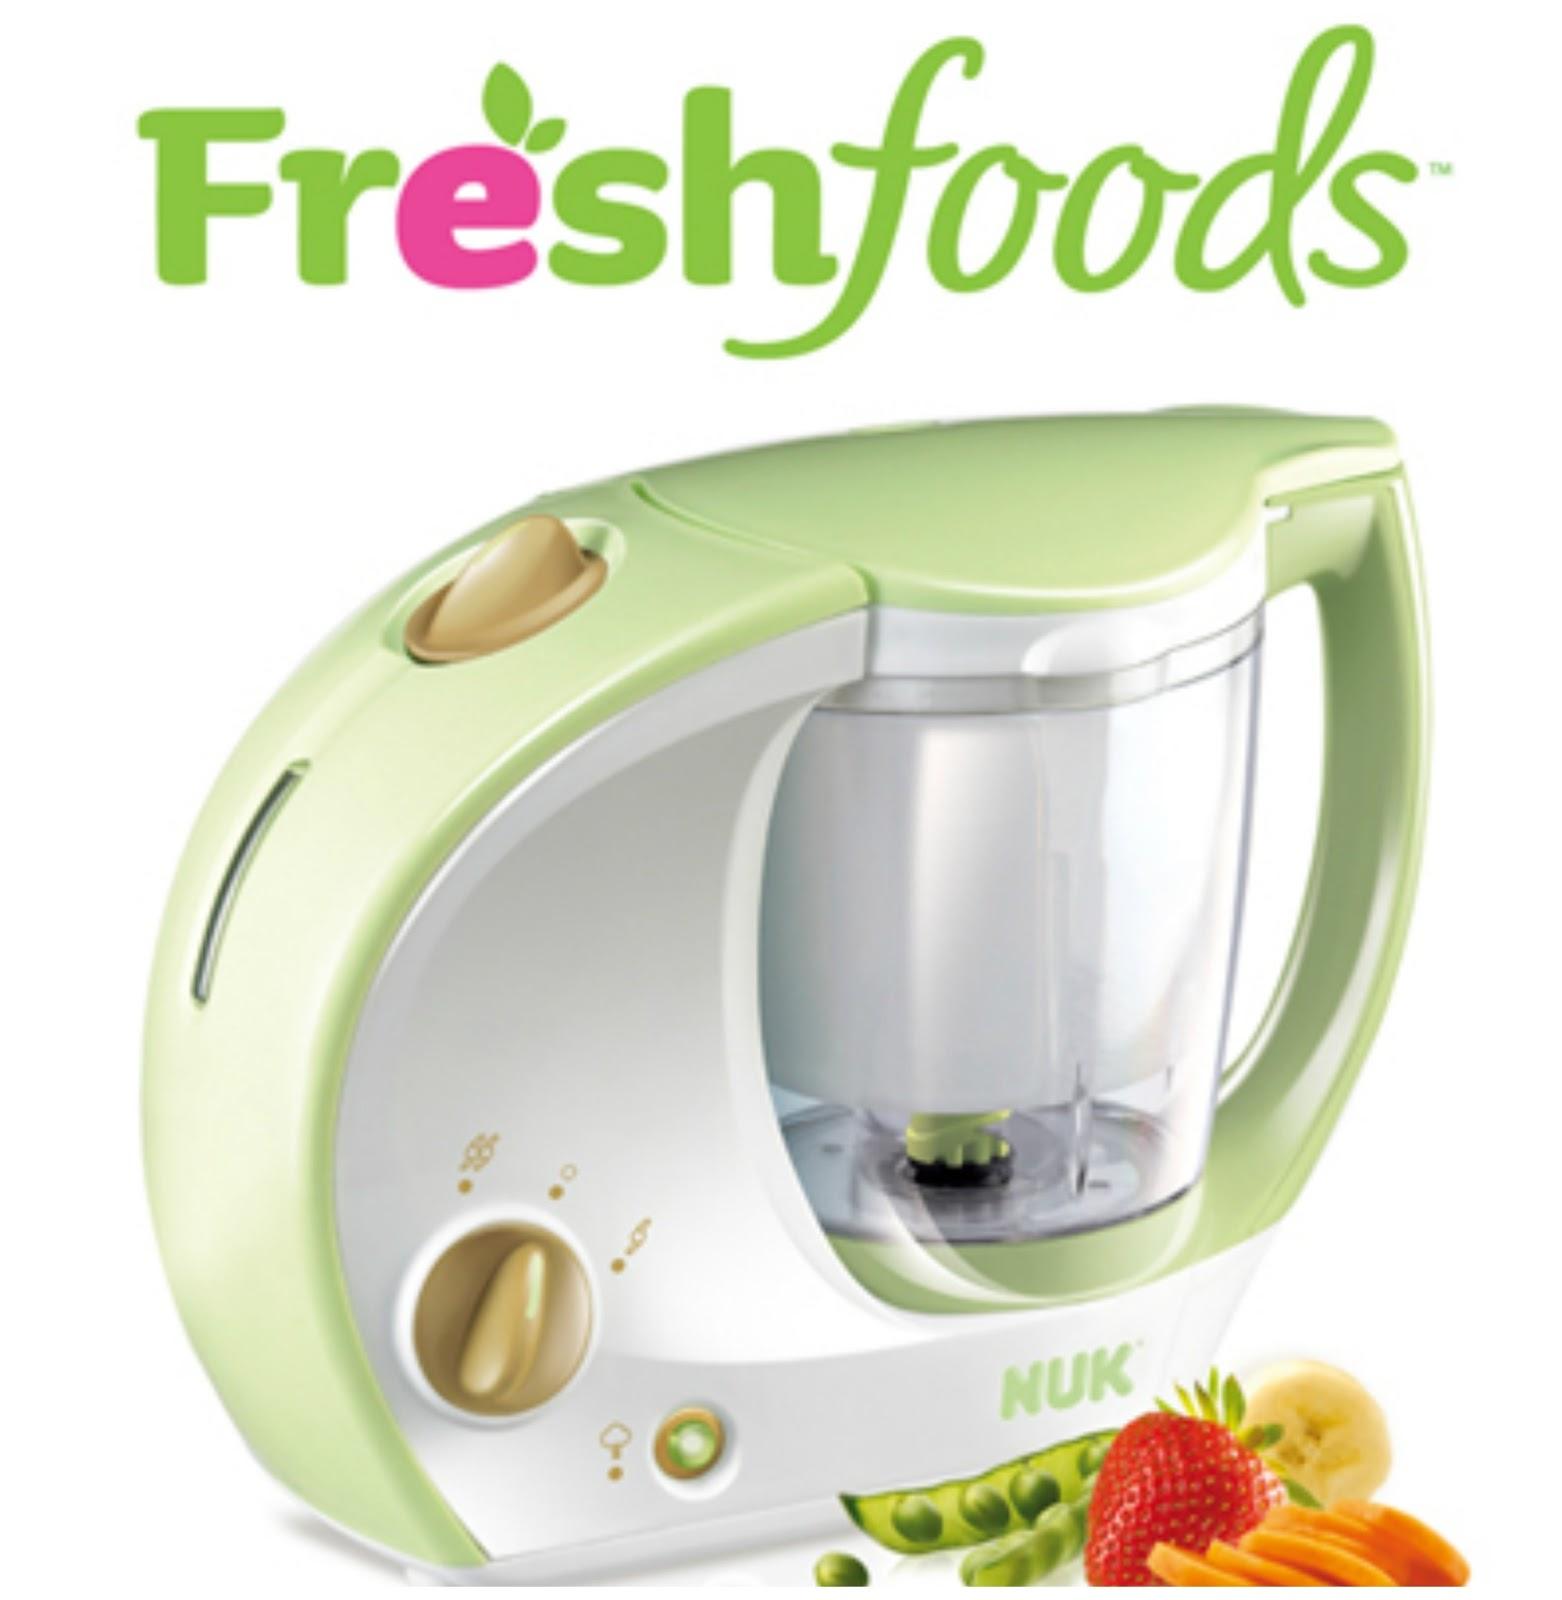 Nuk Cook N Blend Baby Food Maker